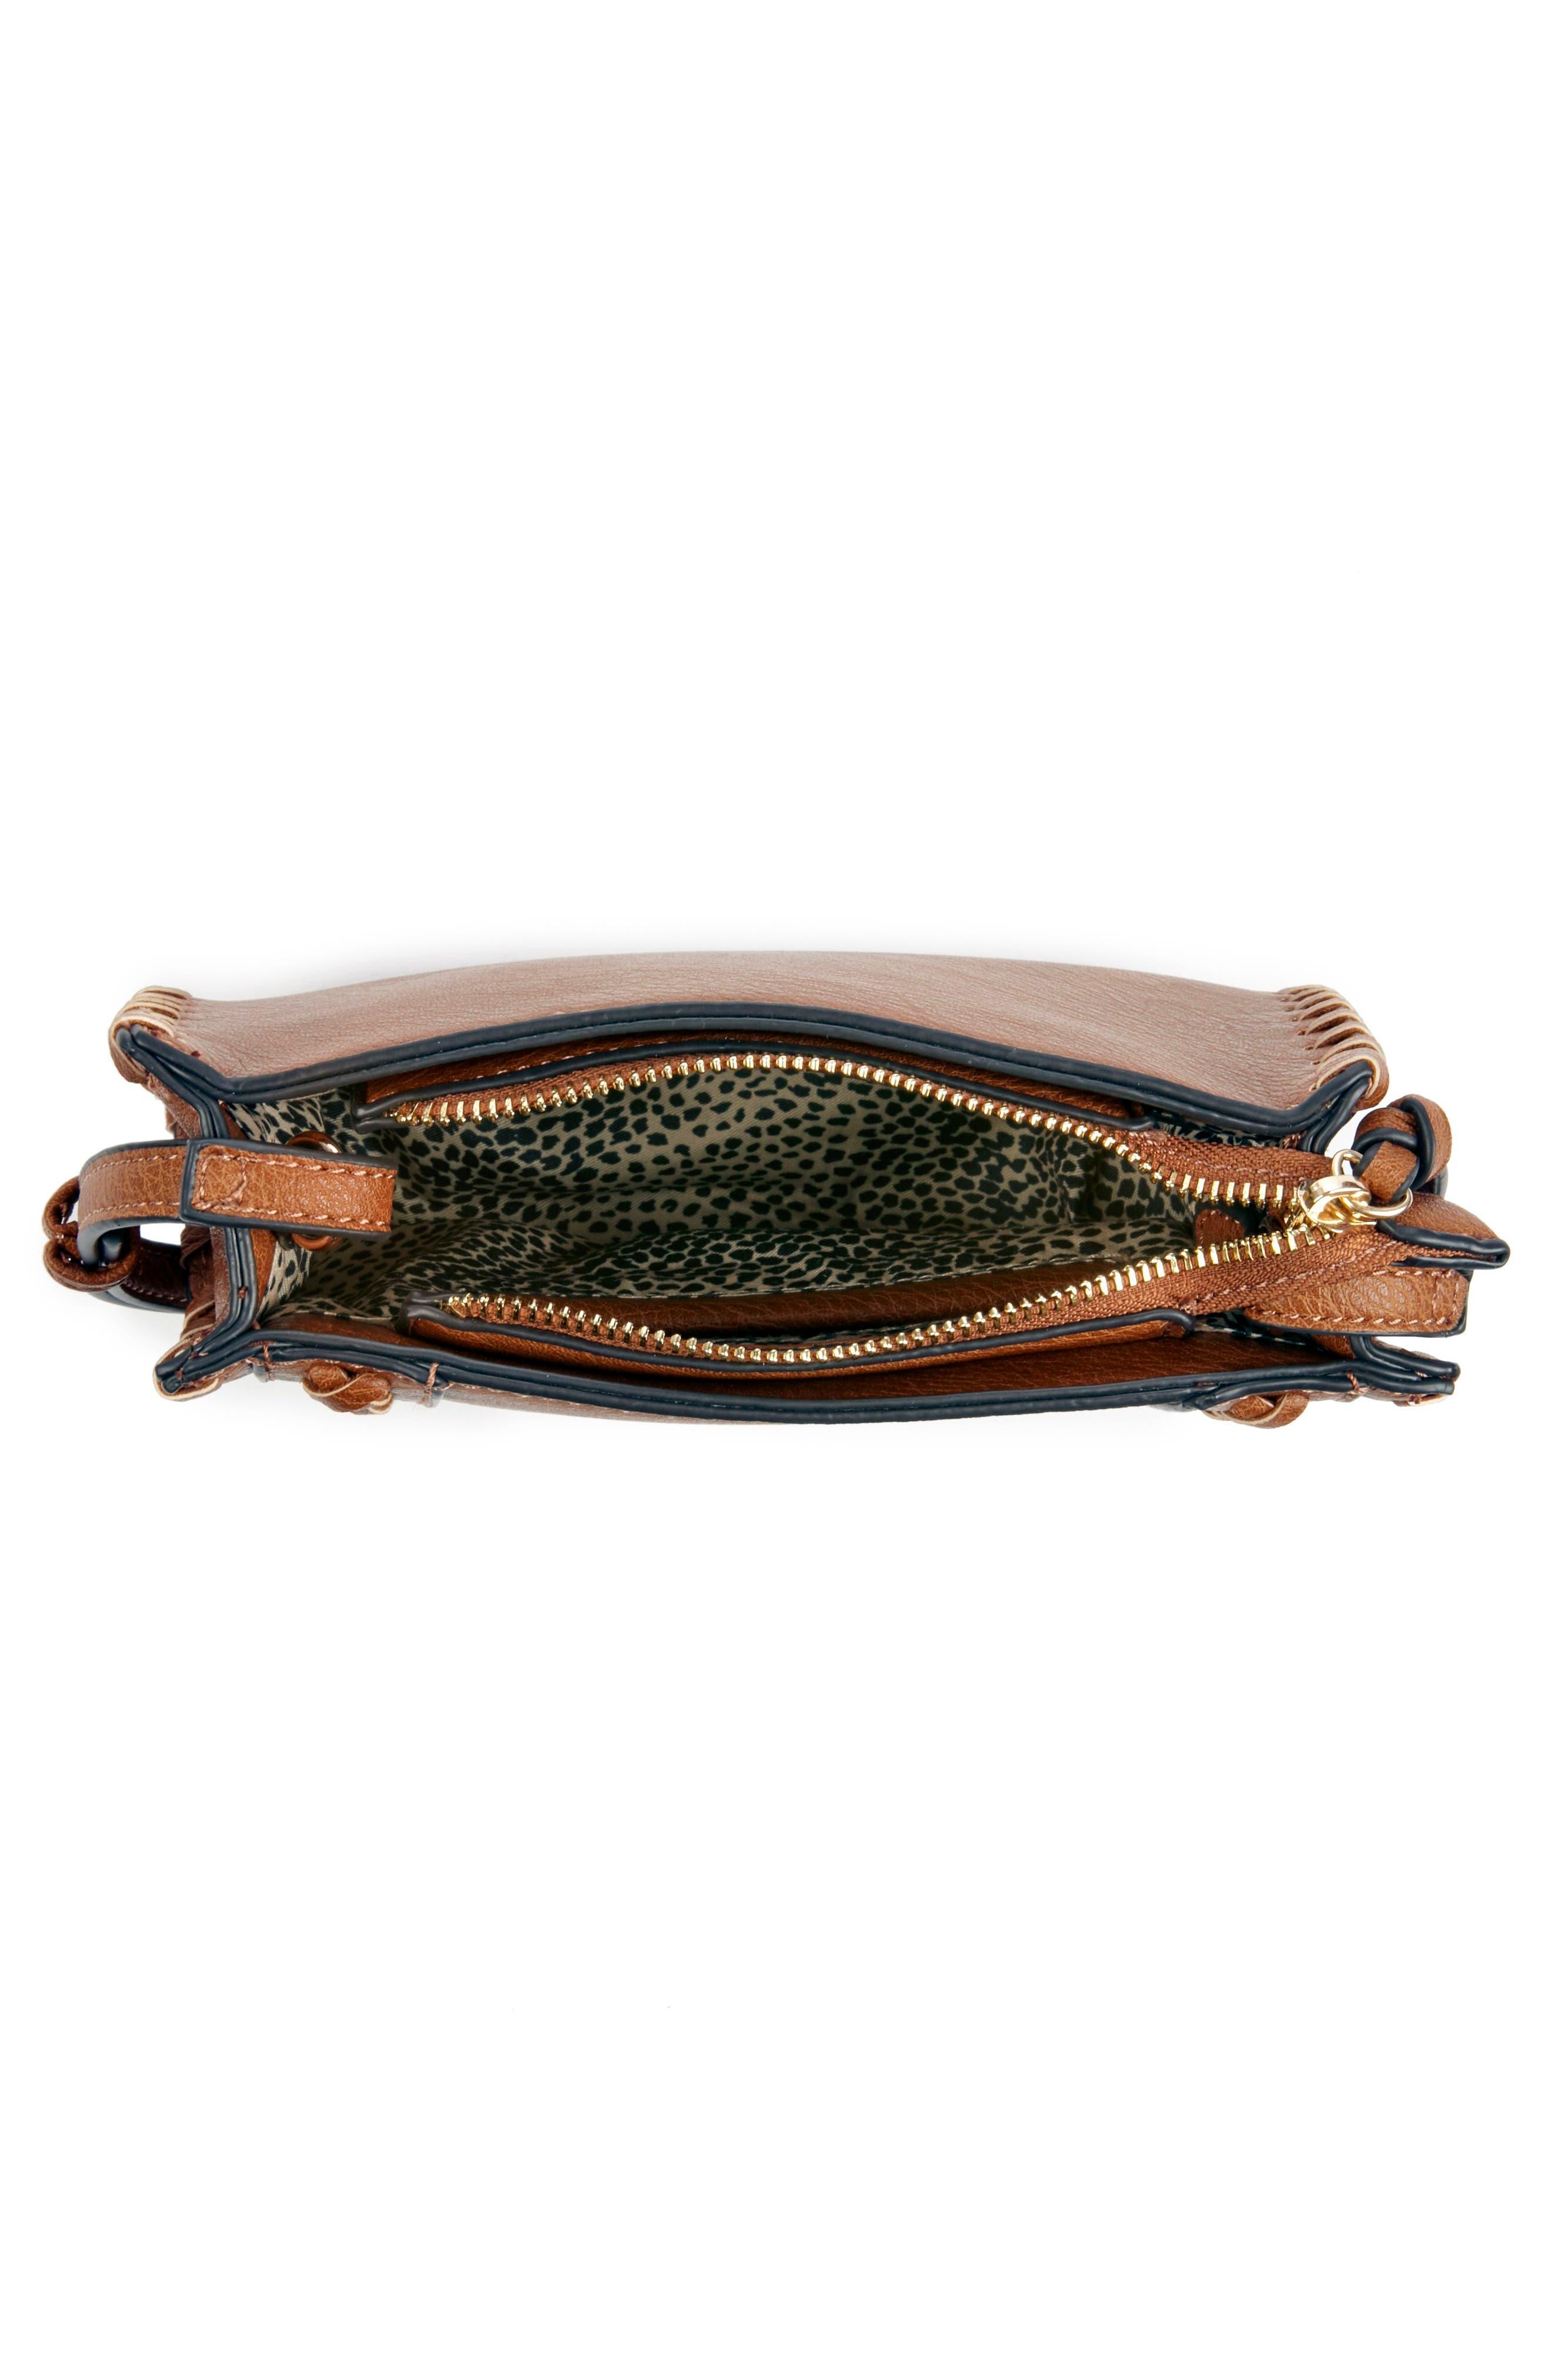 SOLE SOCIETY,                             Destin Faux Leather Crossbody Bag,                             Alternate thumbnail 3, color,                             230